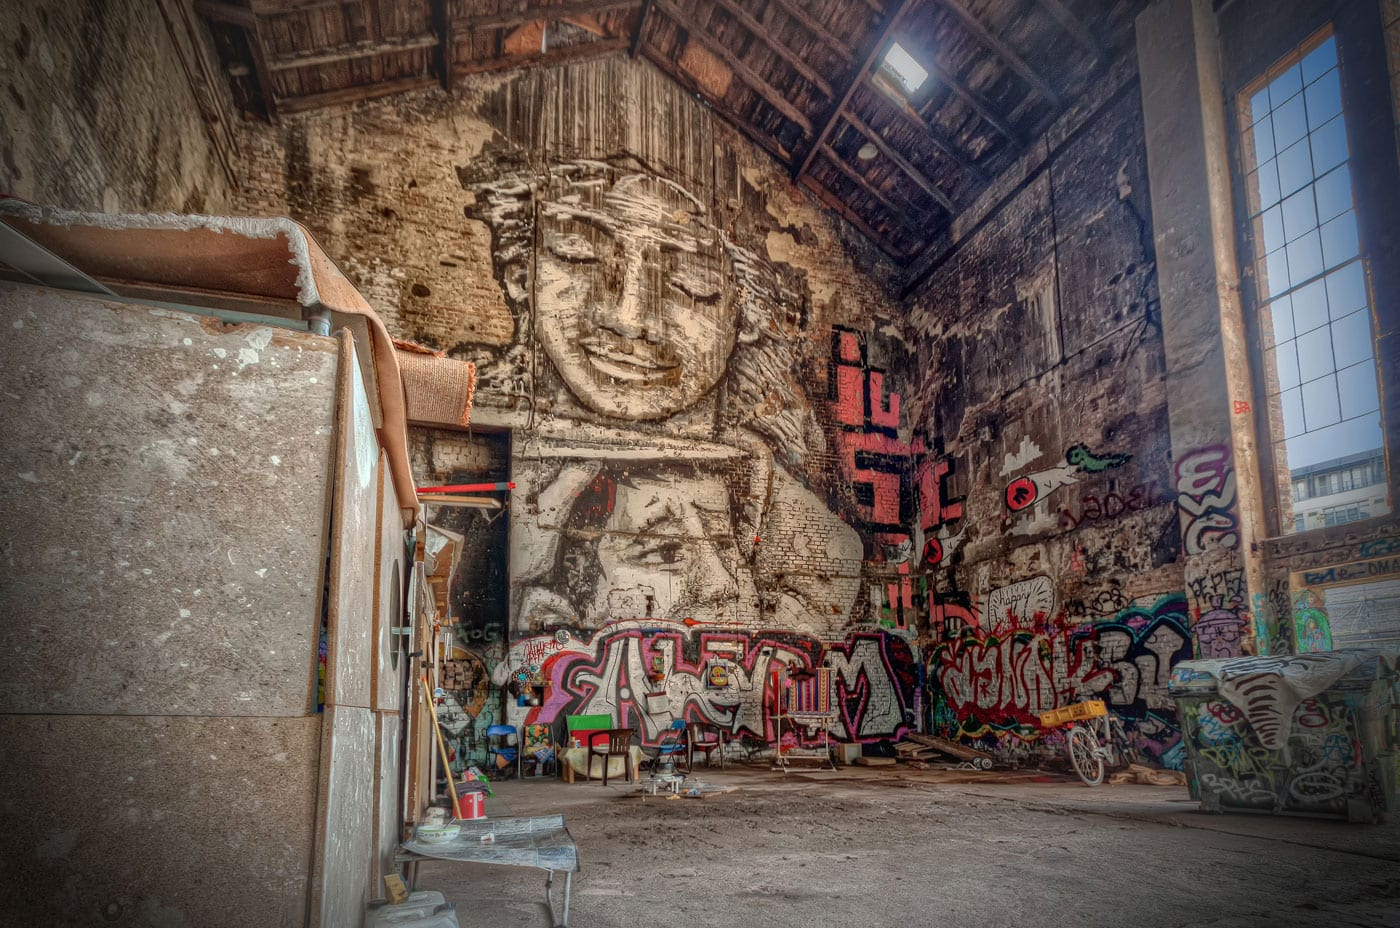 Slums in Berlin | Germany